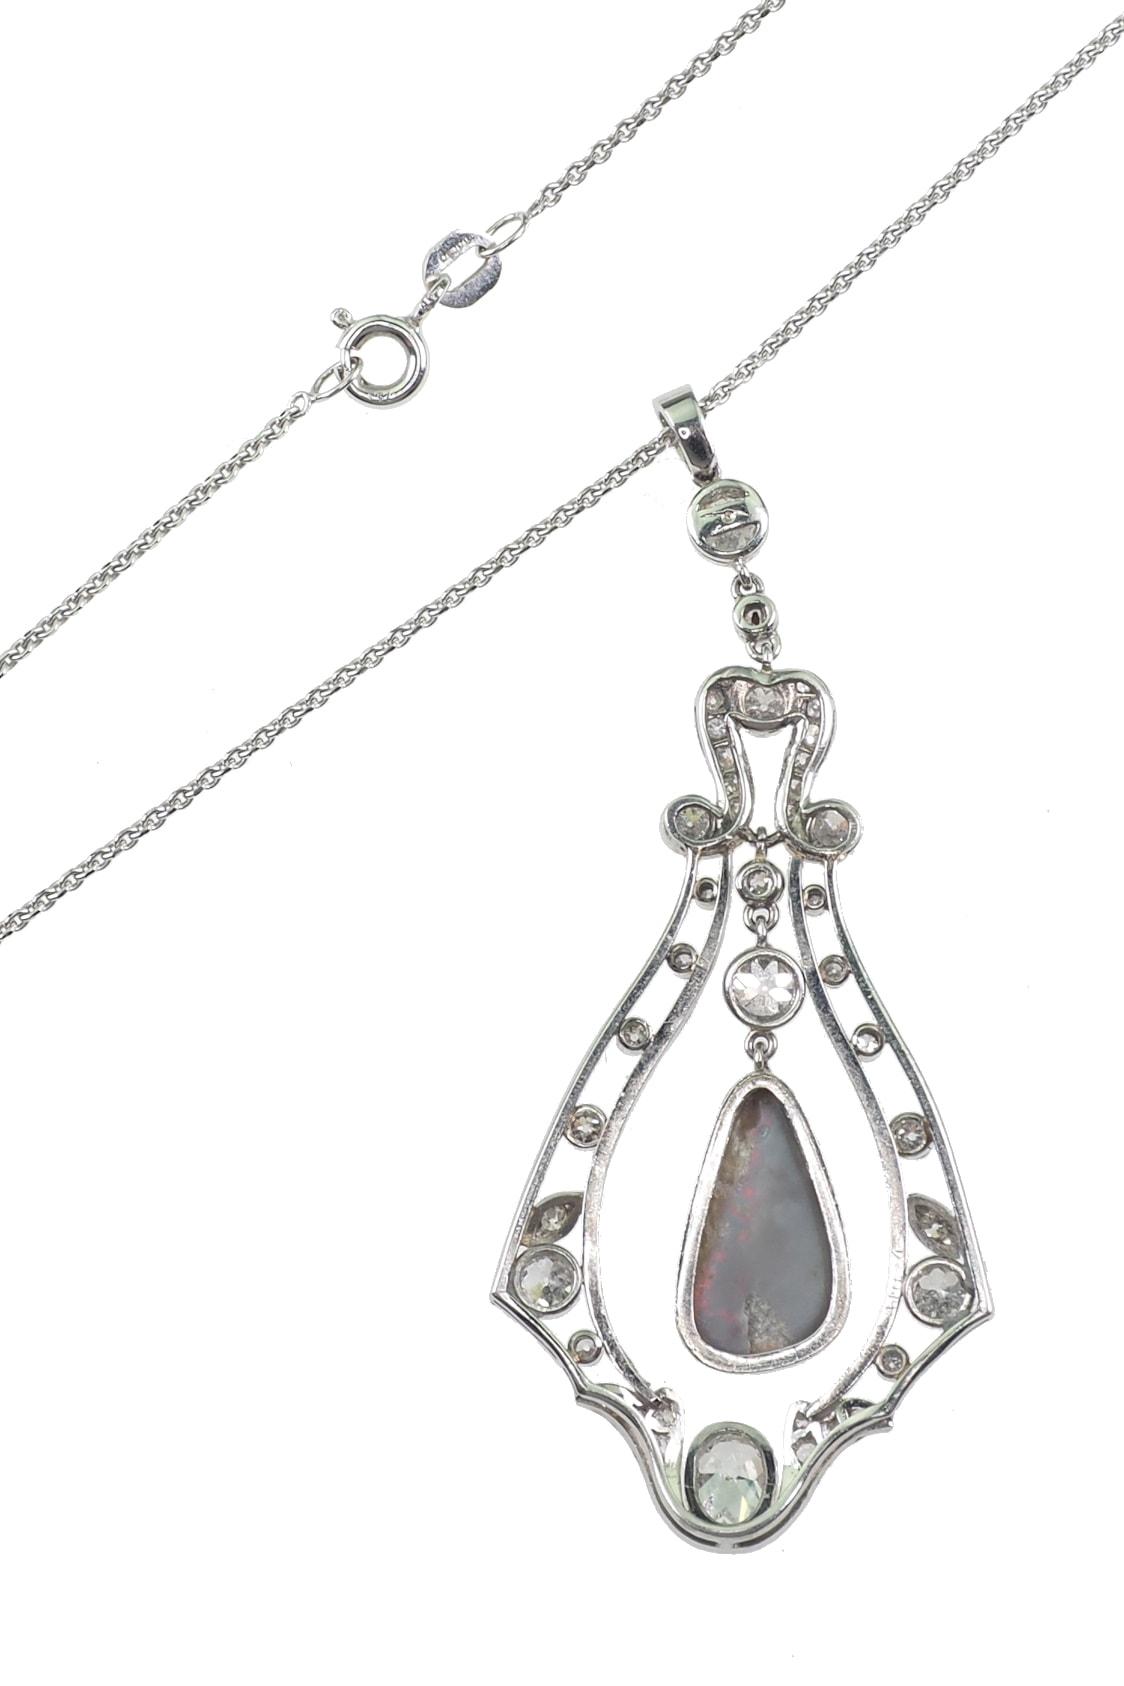 luxurious-antique-jewellery-2827d